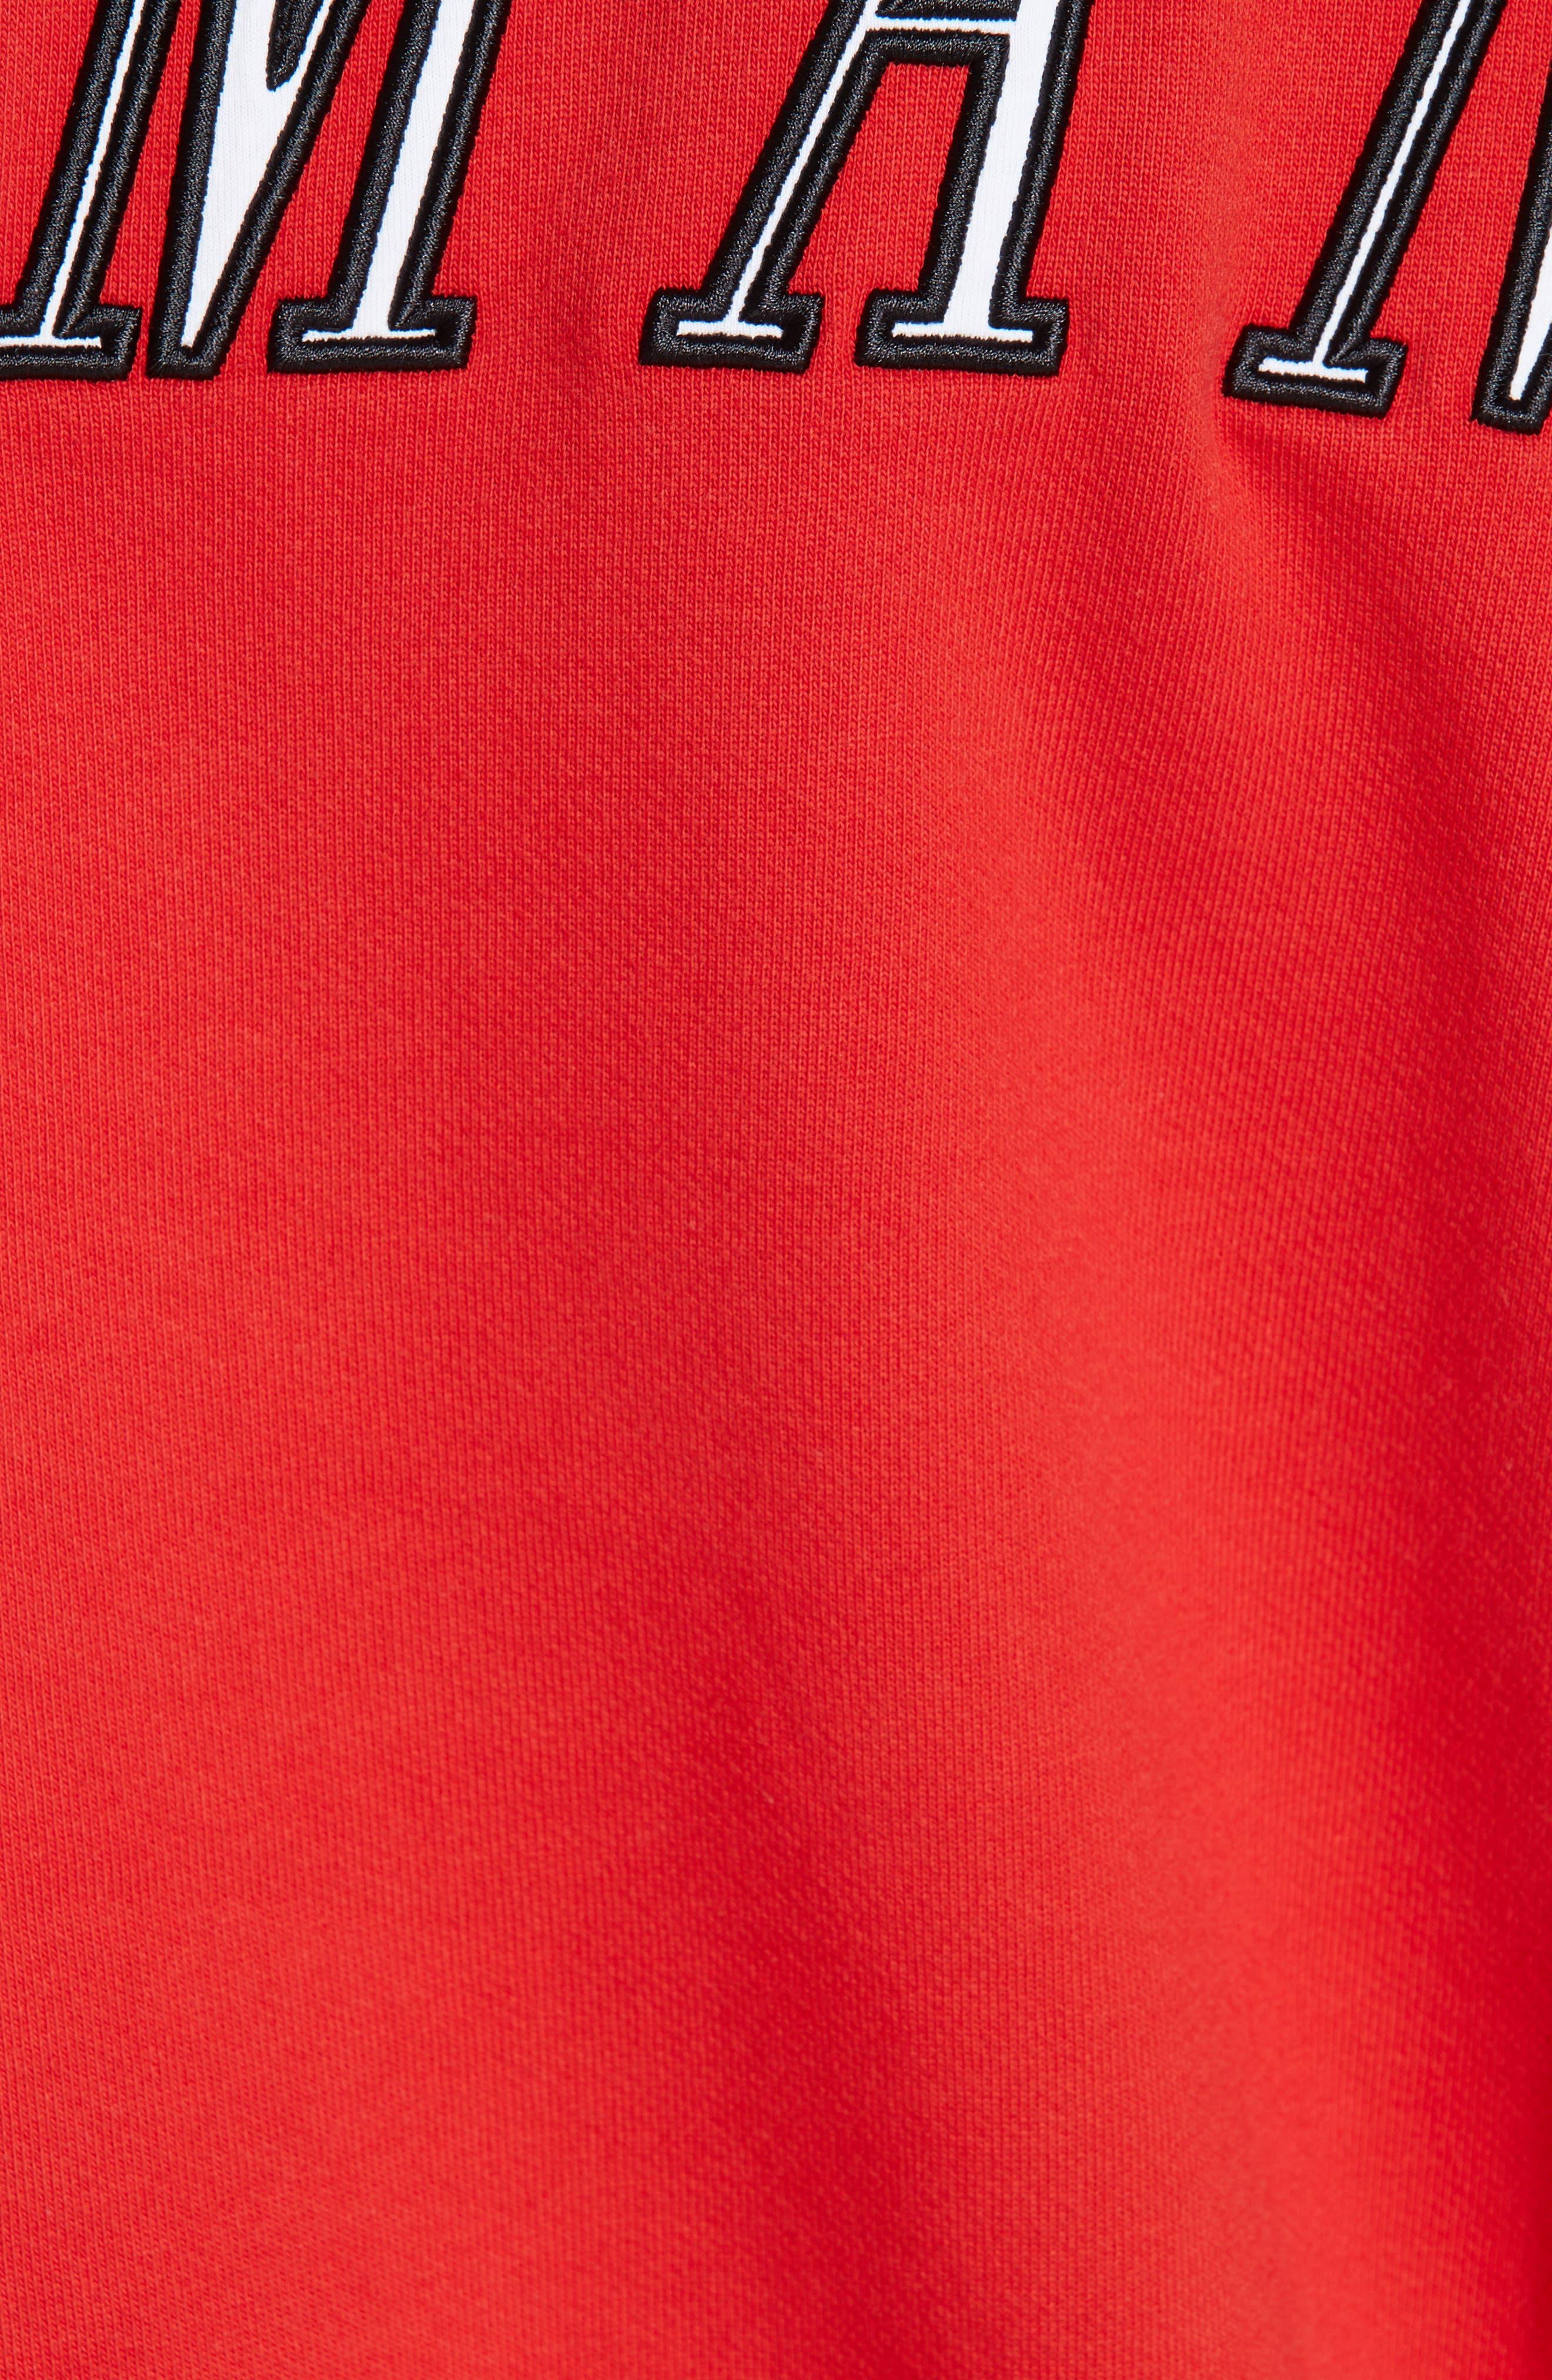 Jockey Checkerboard Crewneck Sweatshirt,                             Alternate thumbnail 5, color,                             600